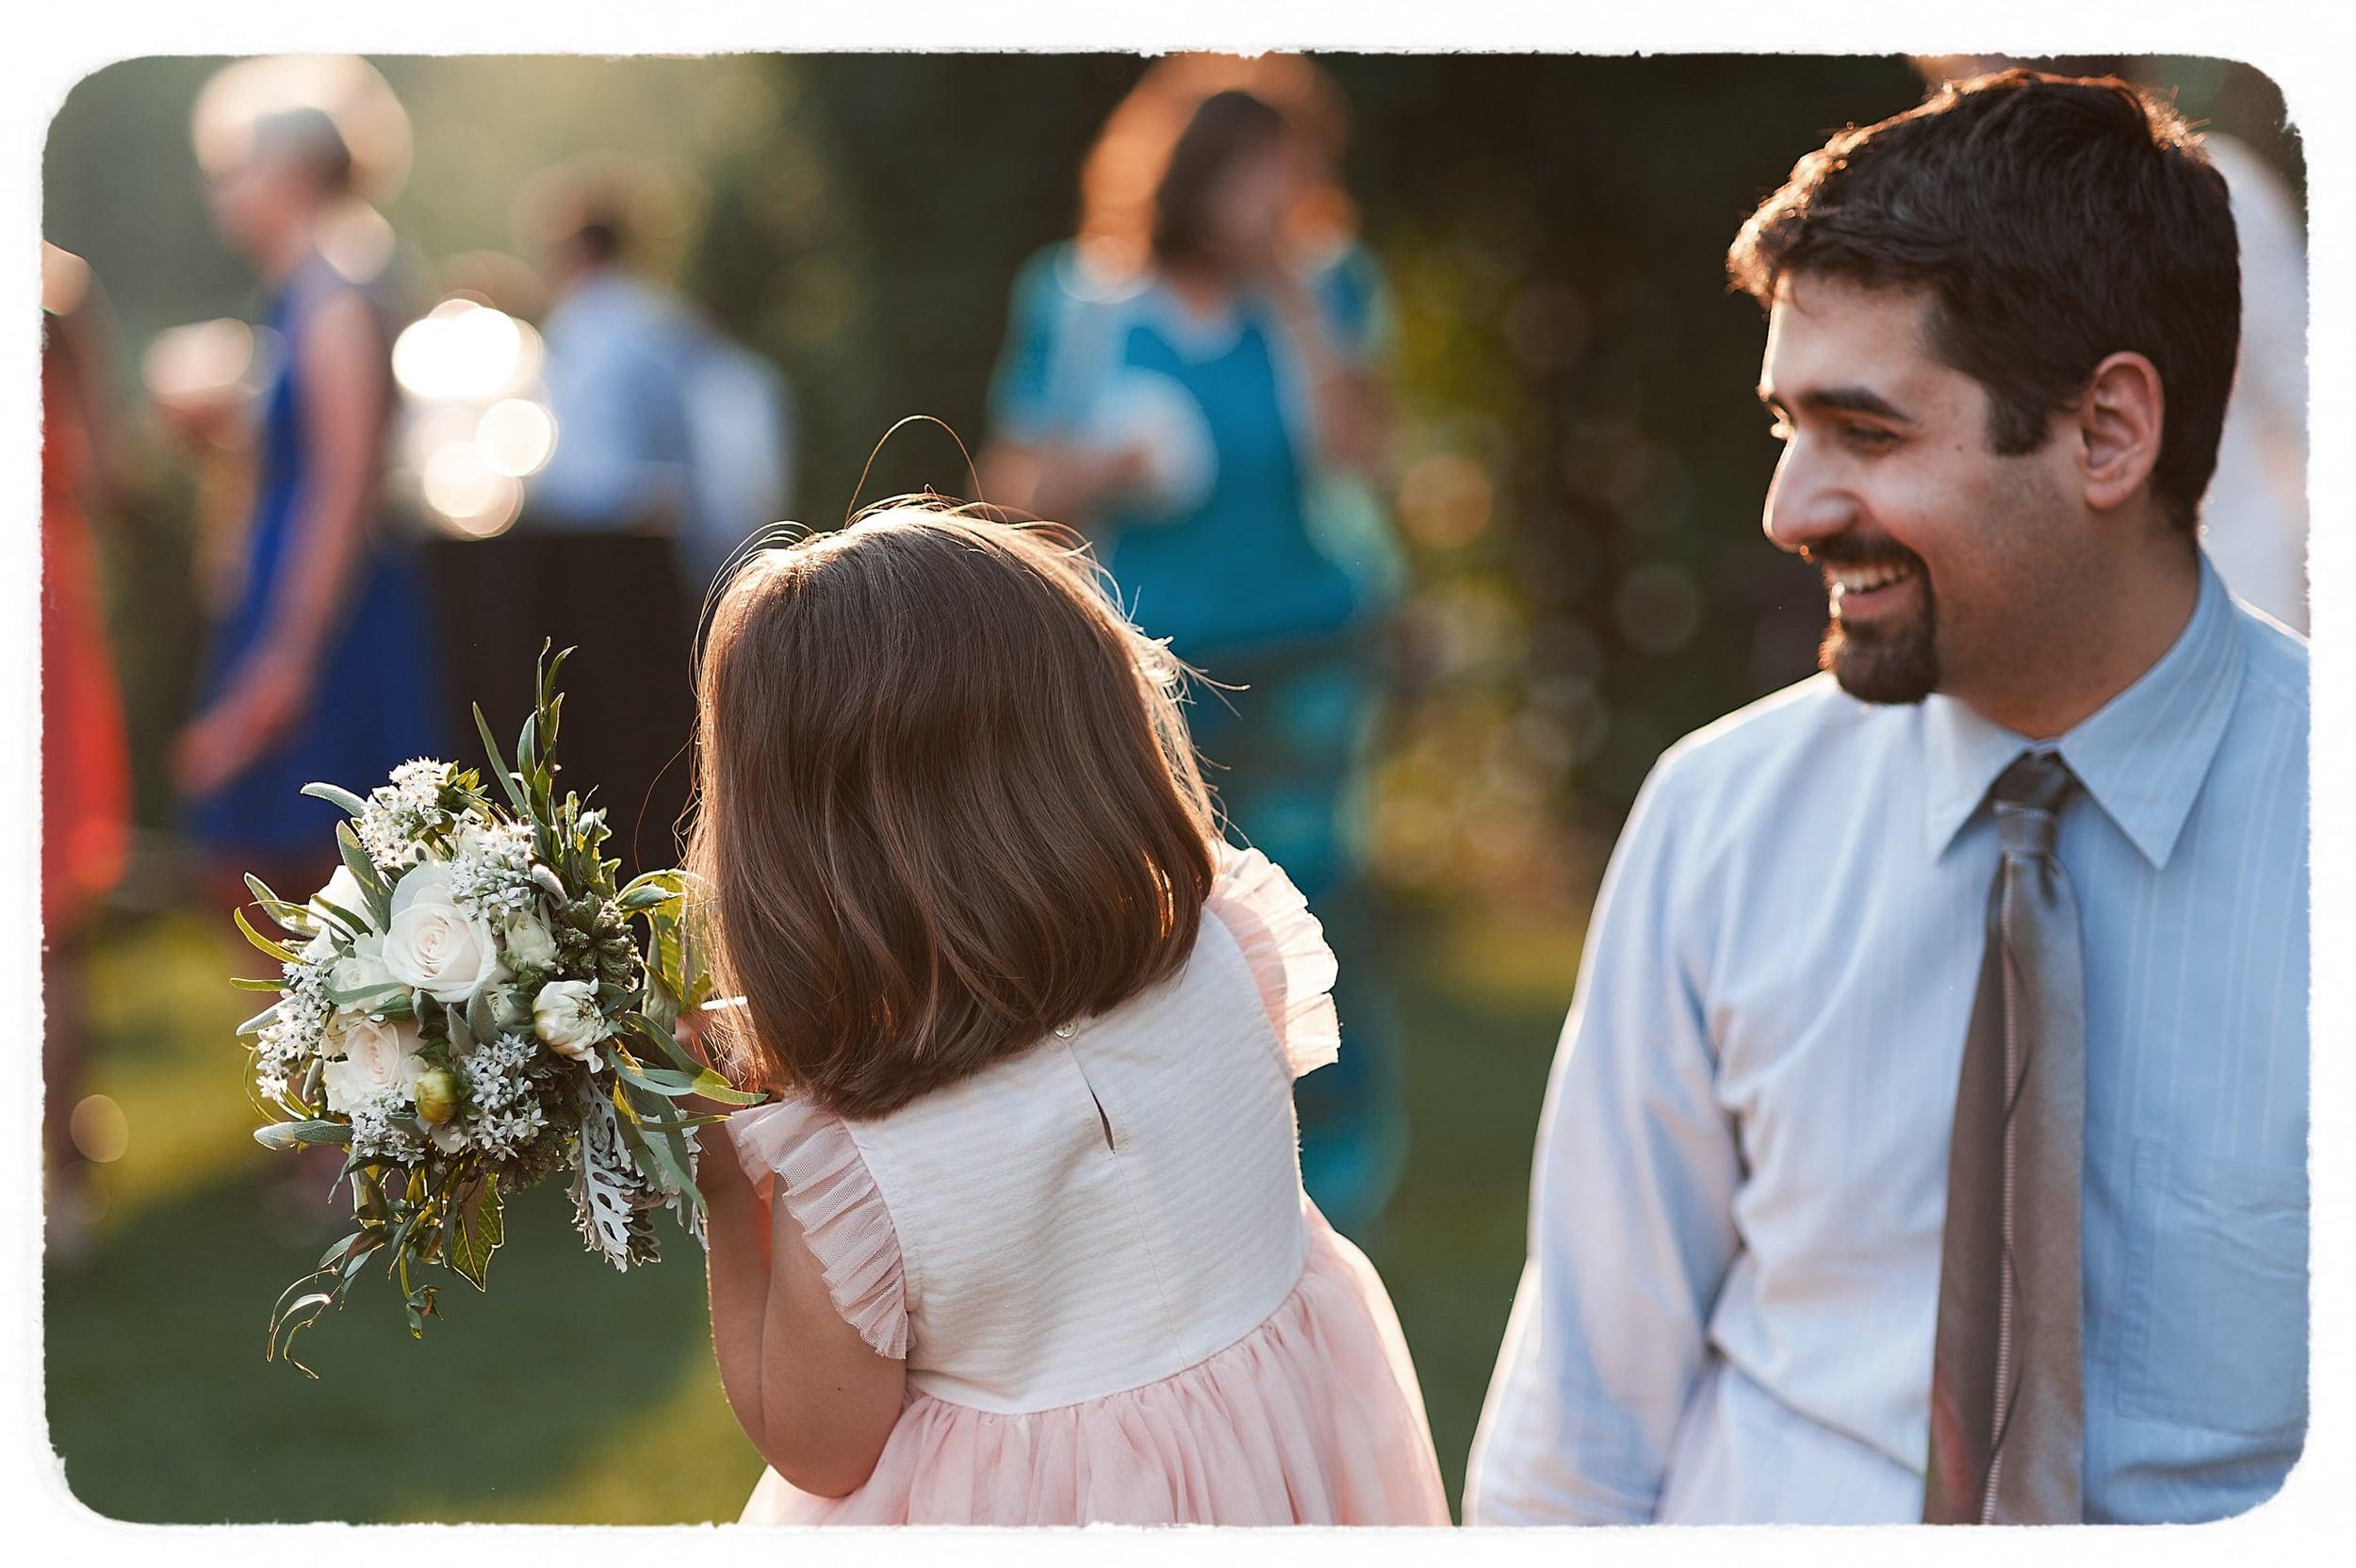 528 Kate&Marc-Wedding-OriginalCollection-528Film.jpg